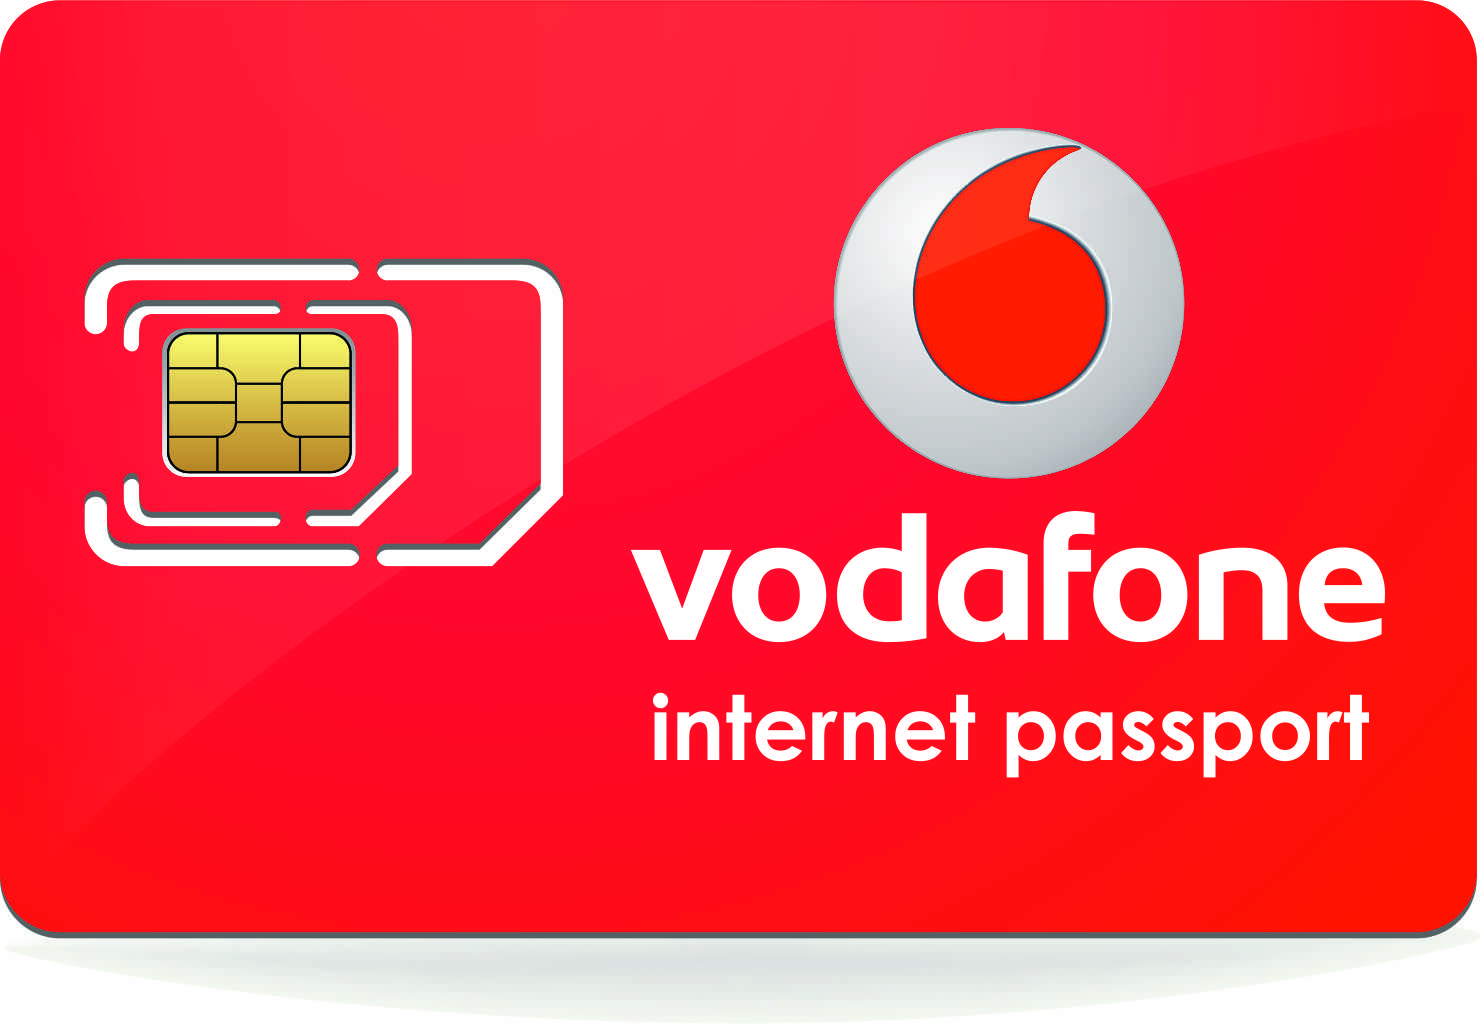 vodafone internet passport